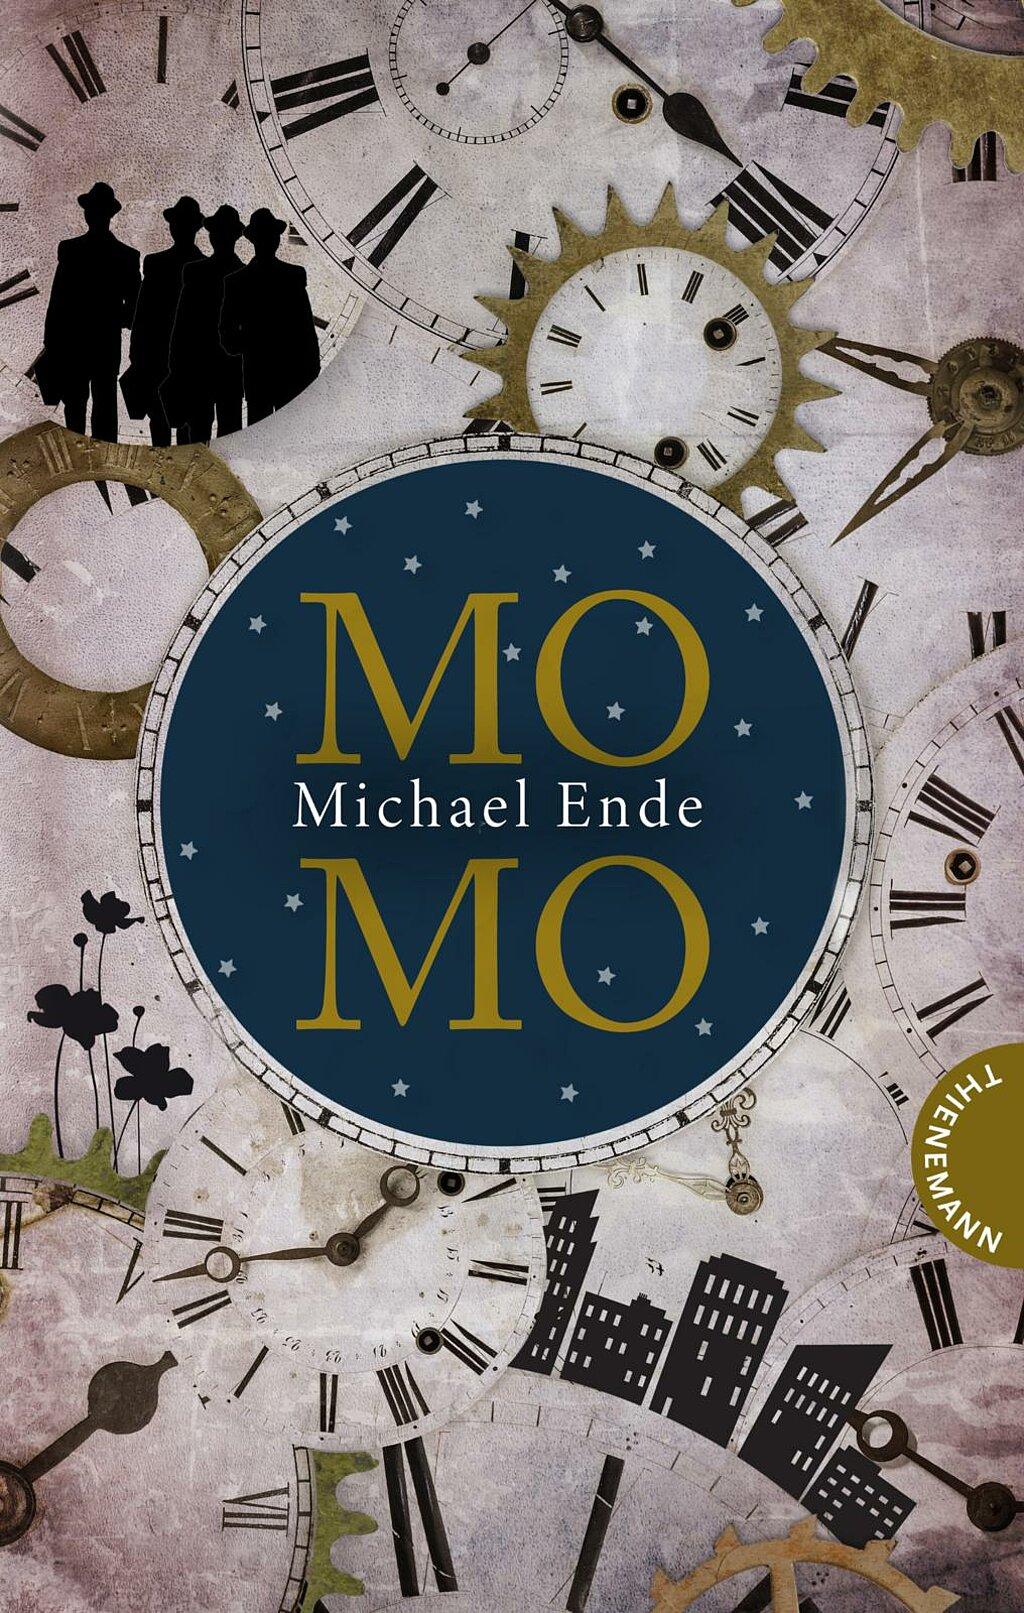 Michael Ende, Klassiker, lesen, Familie, Buchtipp, Kinderbuchklassiker